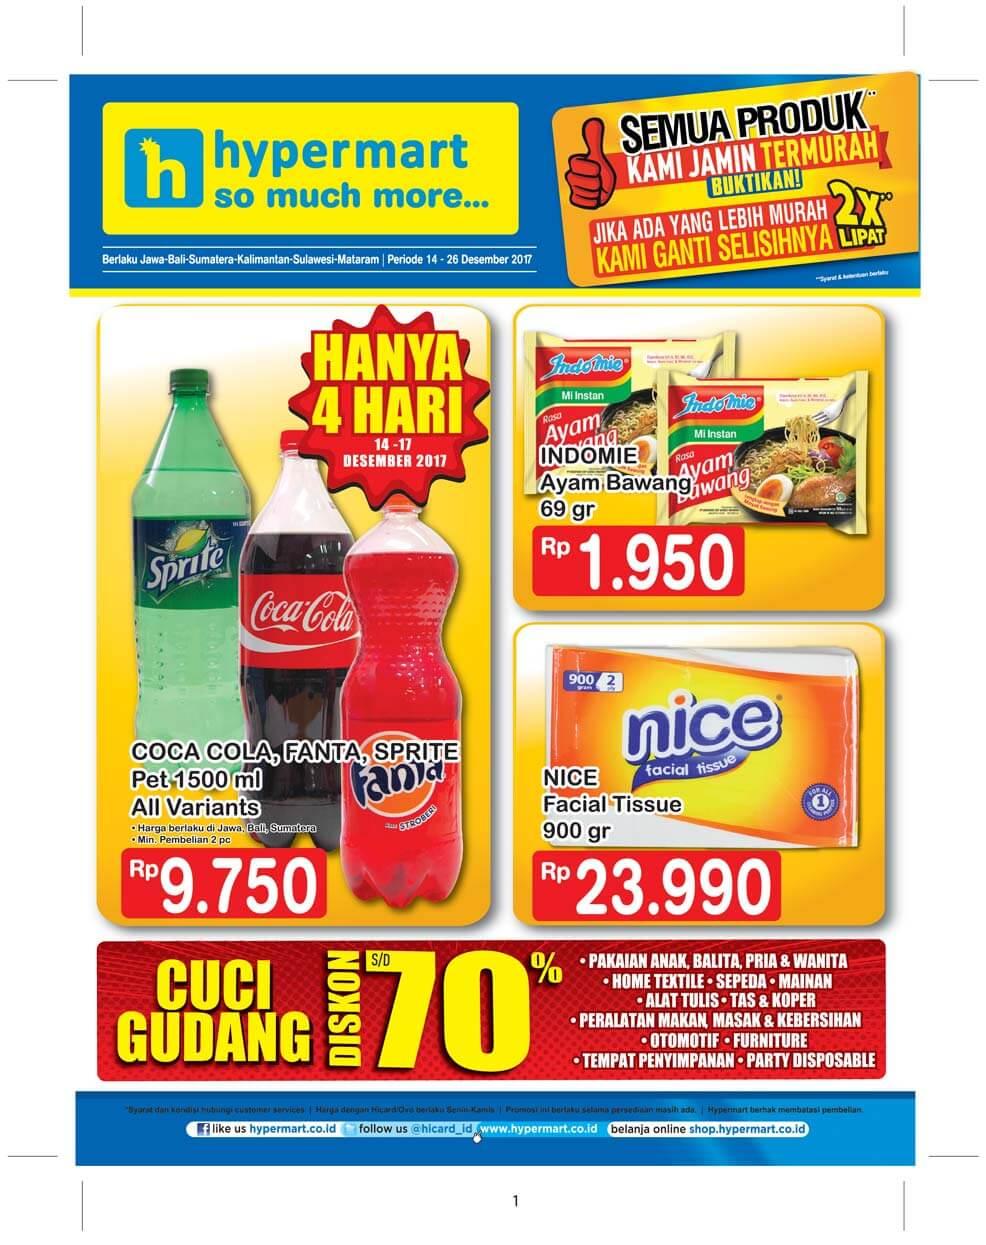 Katalog Hypermart 15 Dec 26 Voucher Belanja